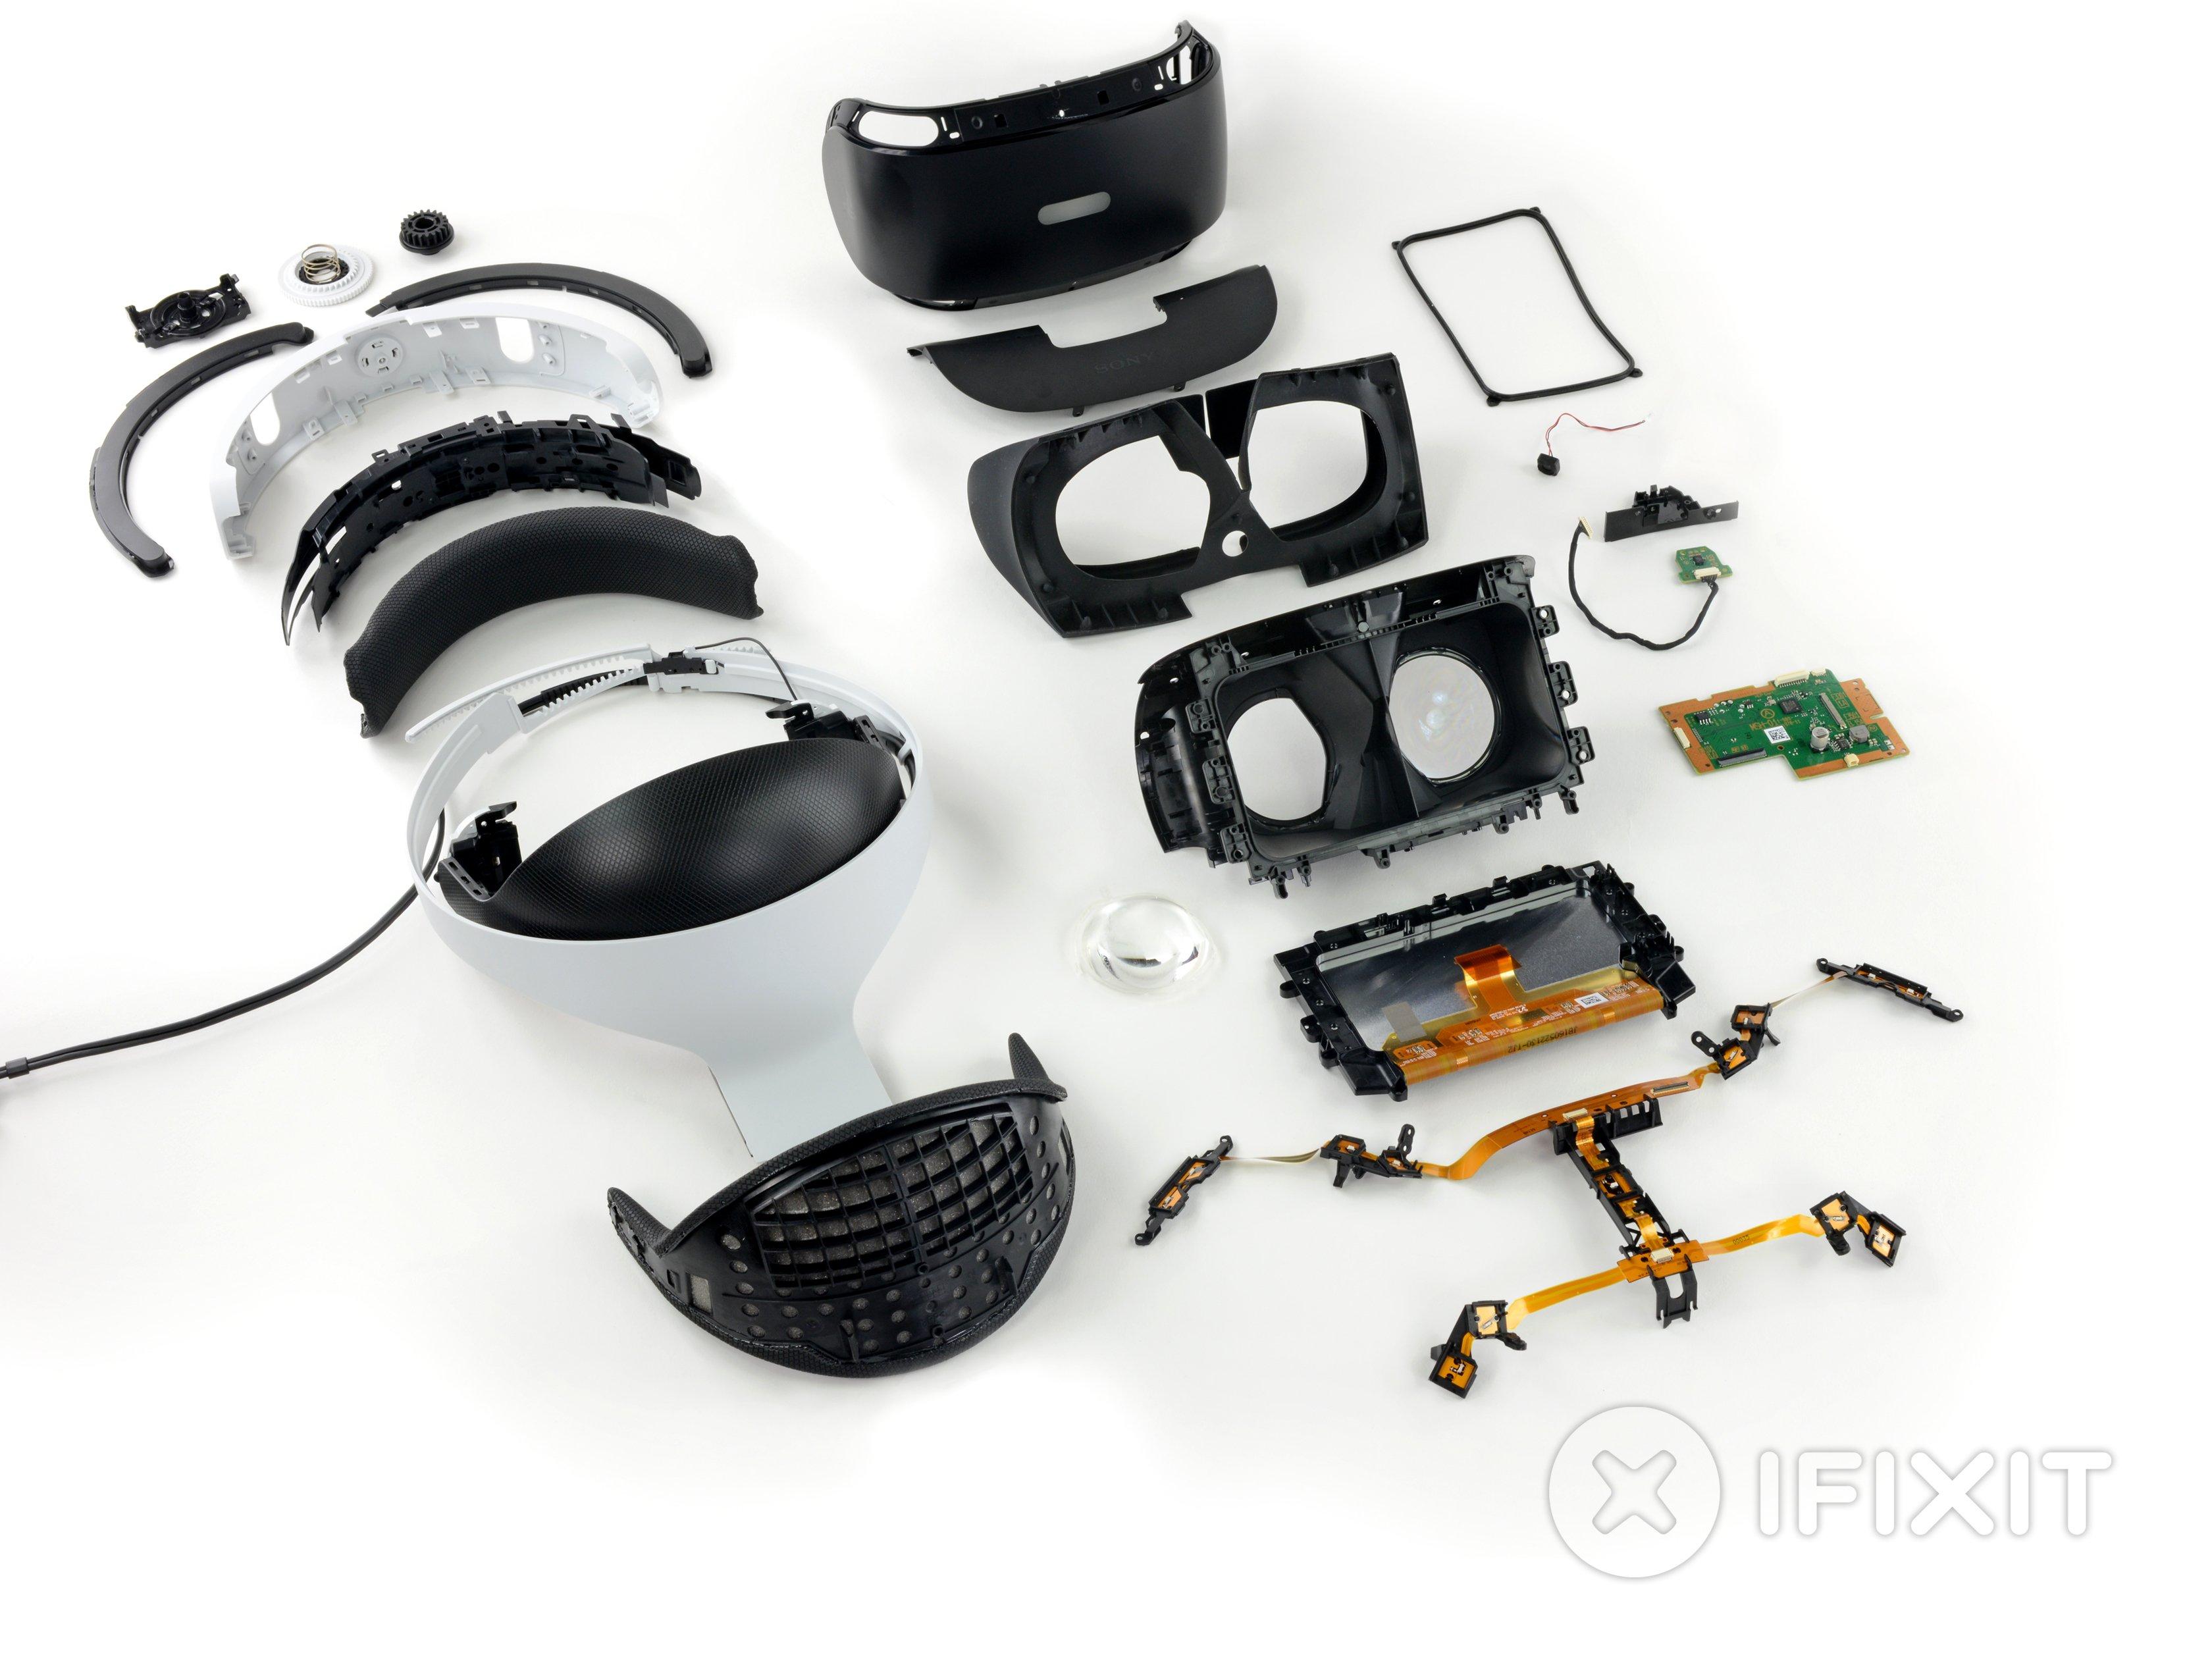 PlayStation VR Teardown